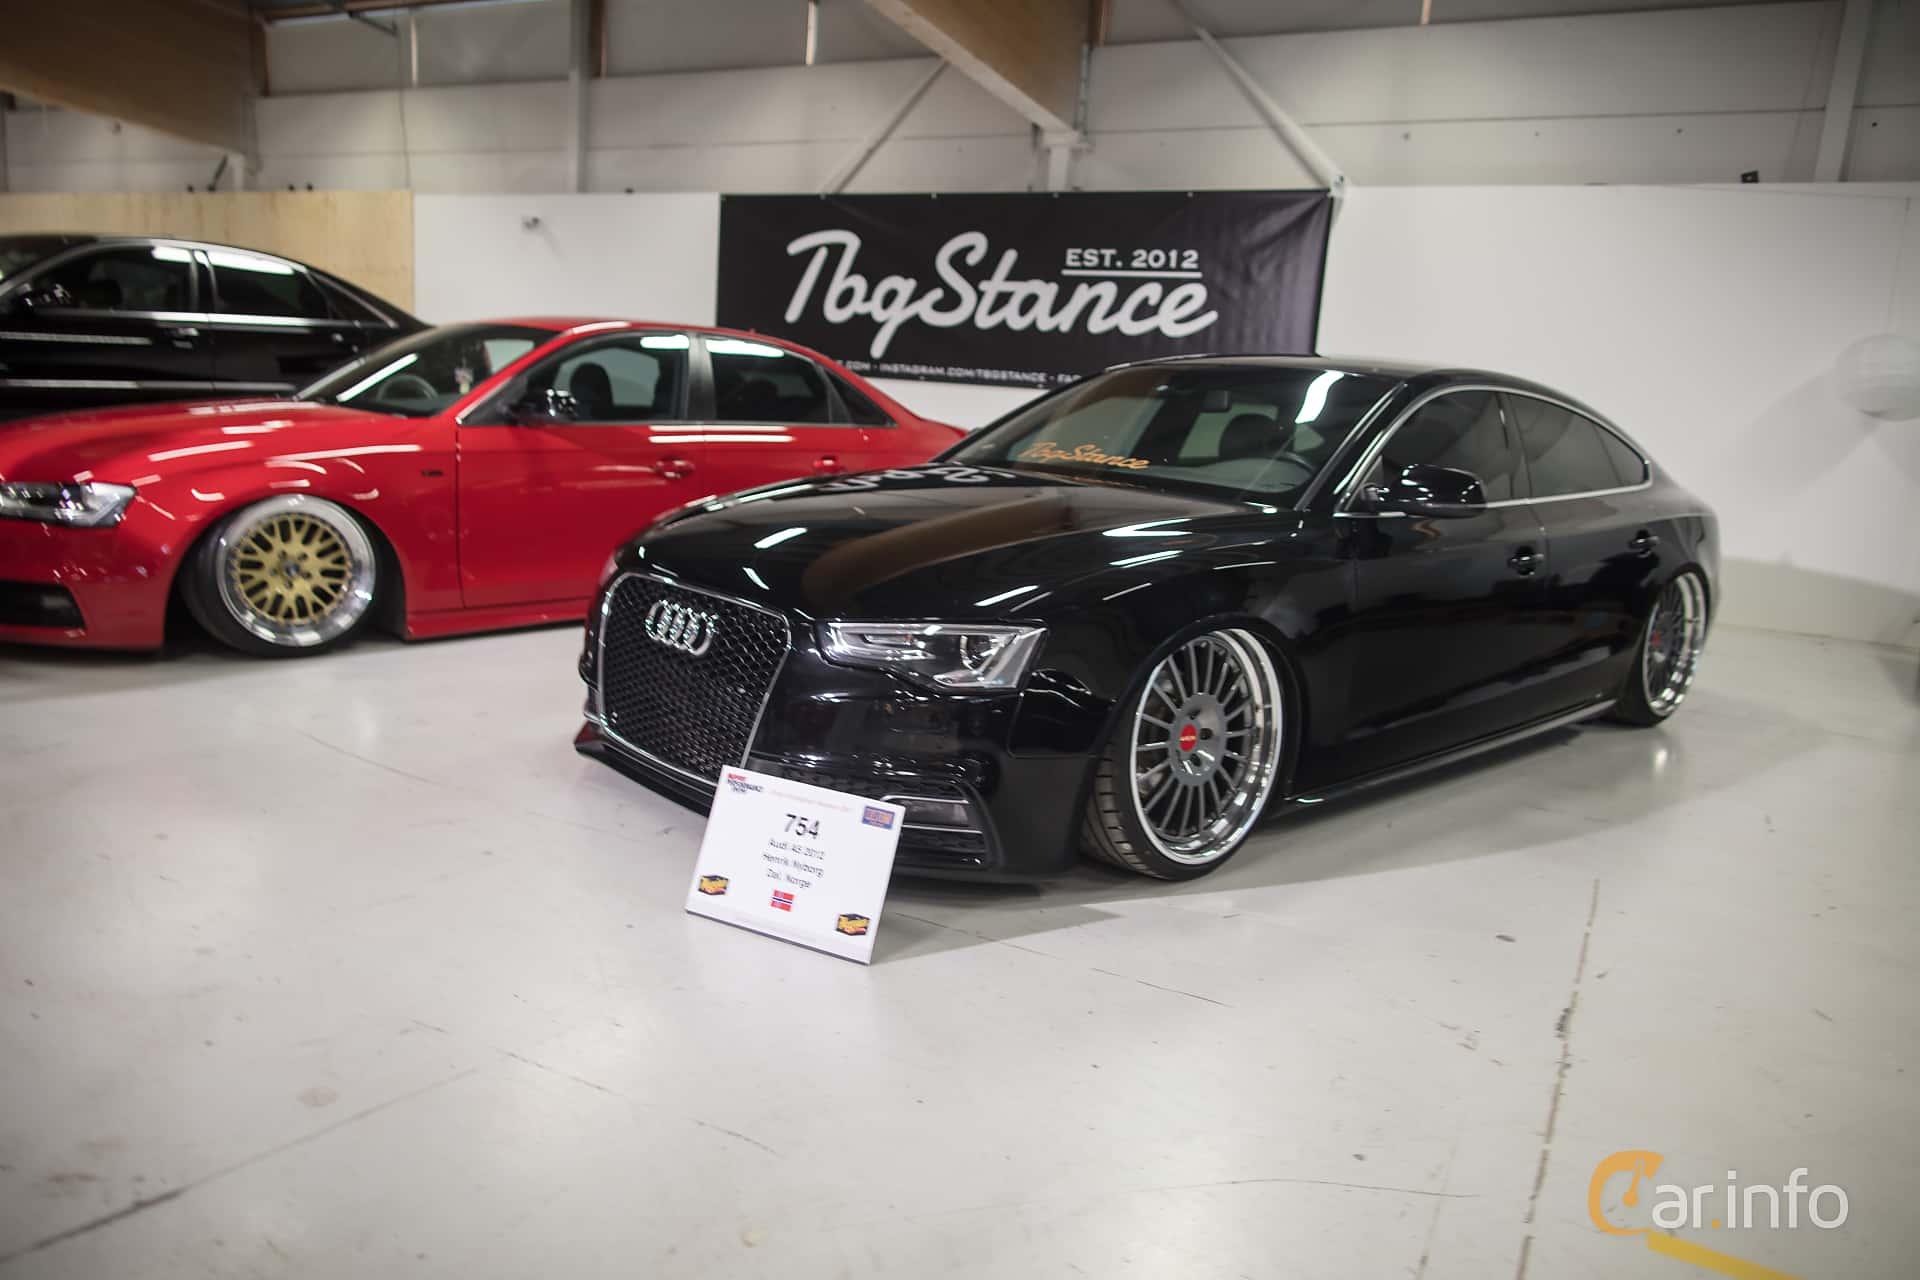 2014 Audi A5 Sema Custom Car For Sale: 5 Images Of Audi A5 Sportback 2012 By Jonasbonde